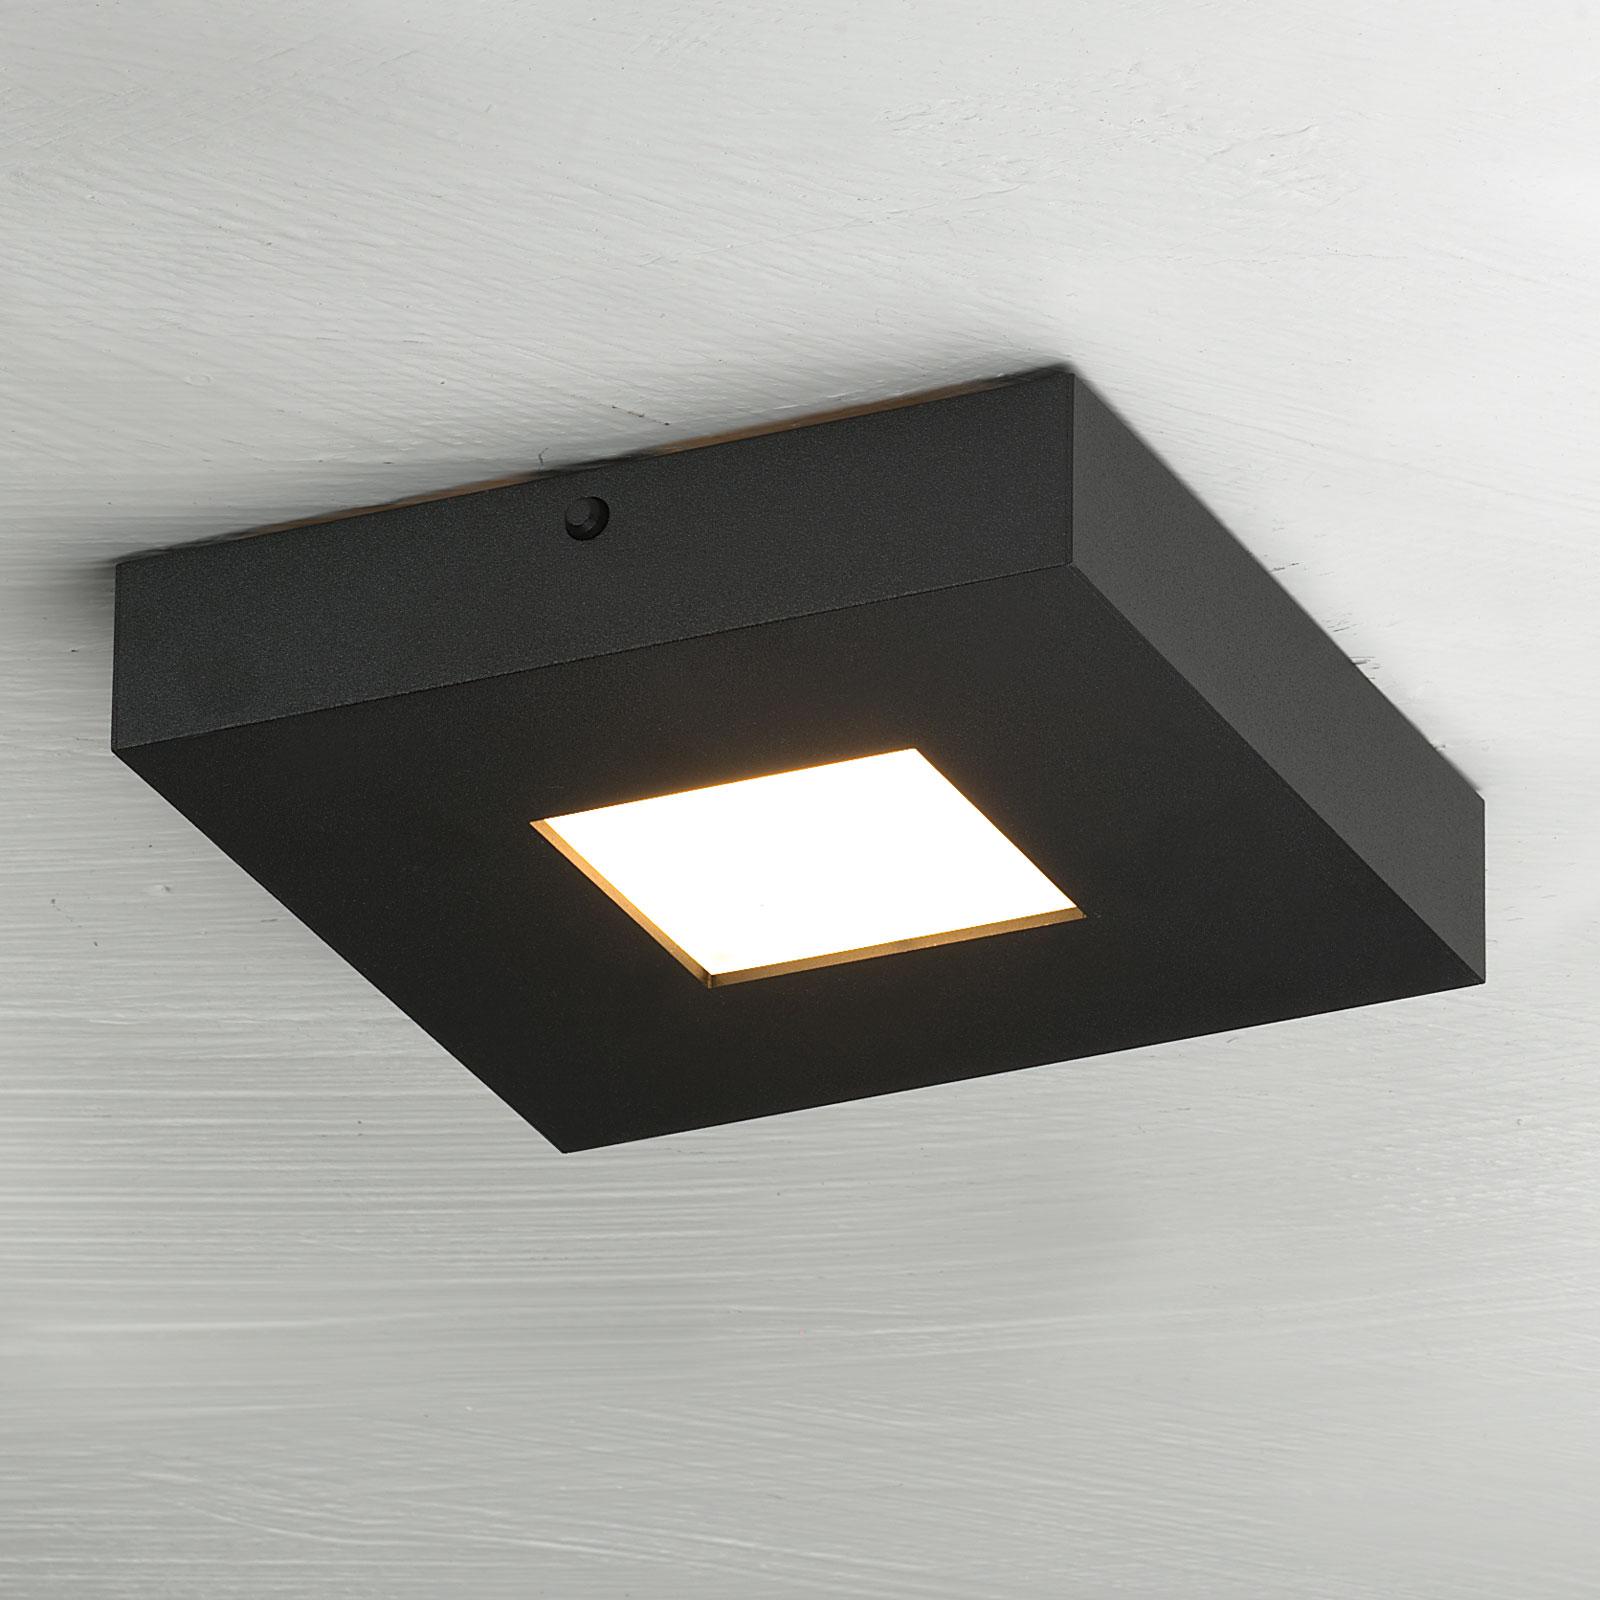 LED ceiling light Cubus in black_1556135_1